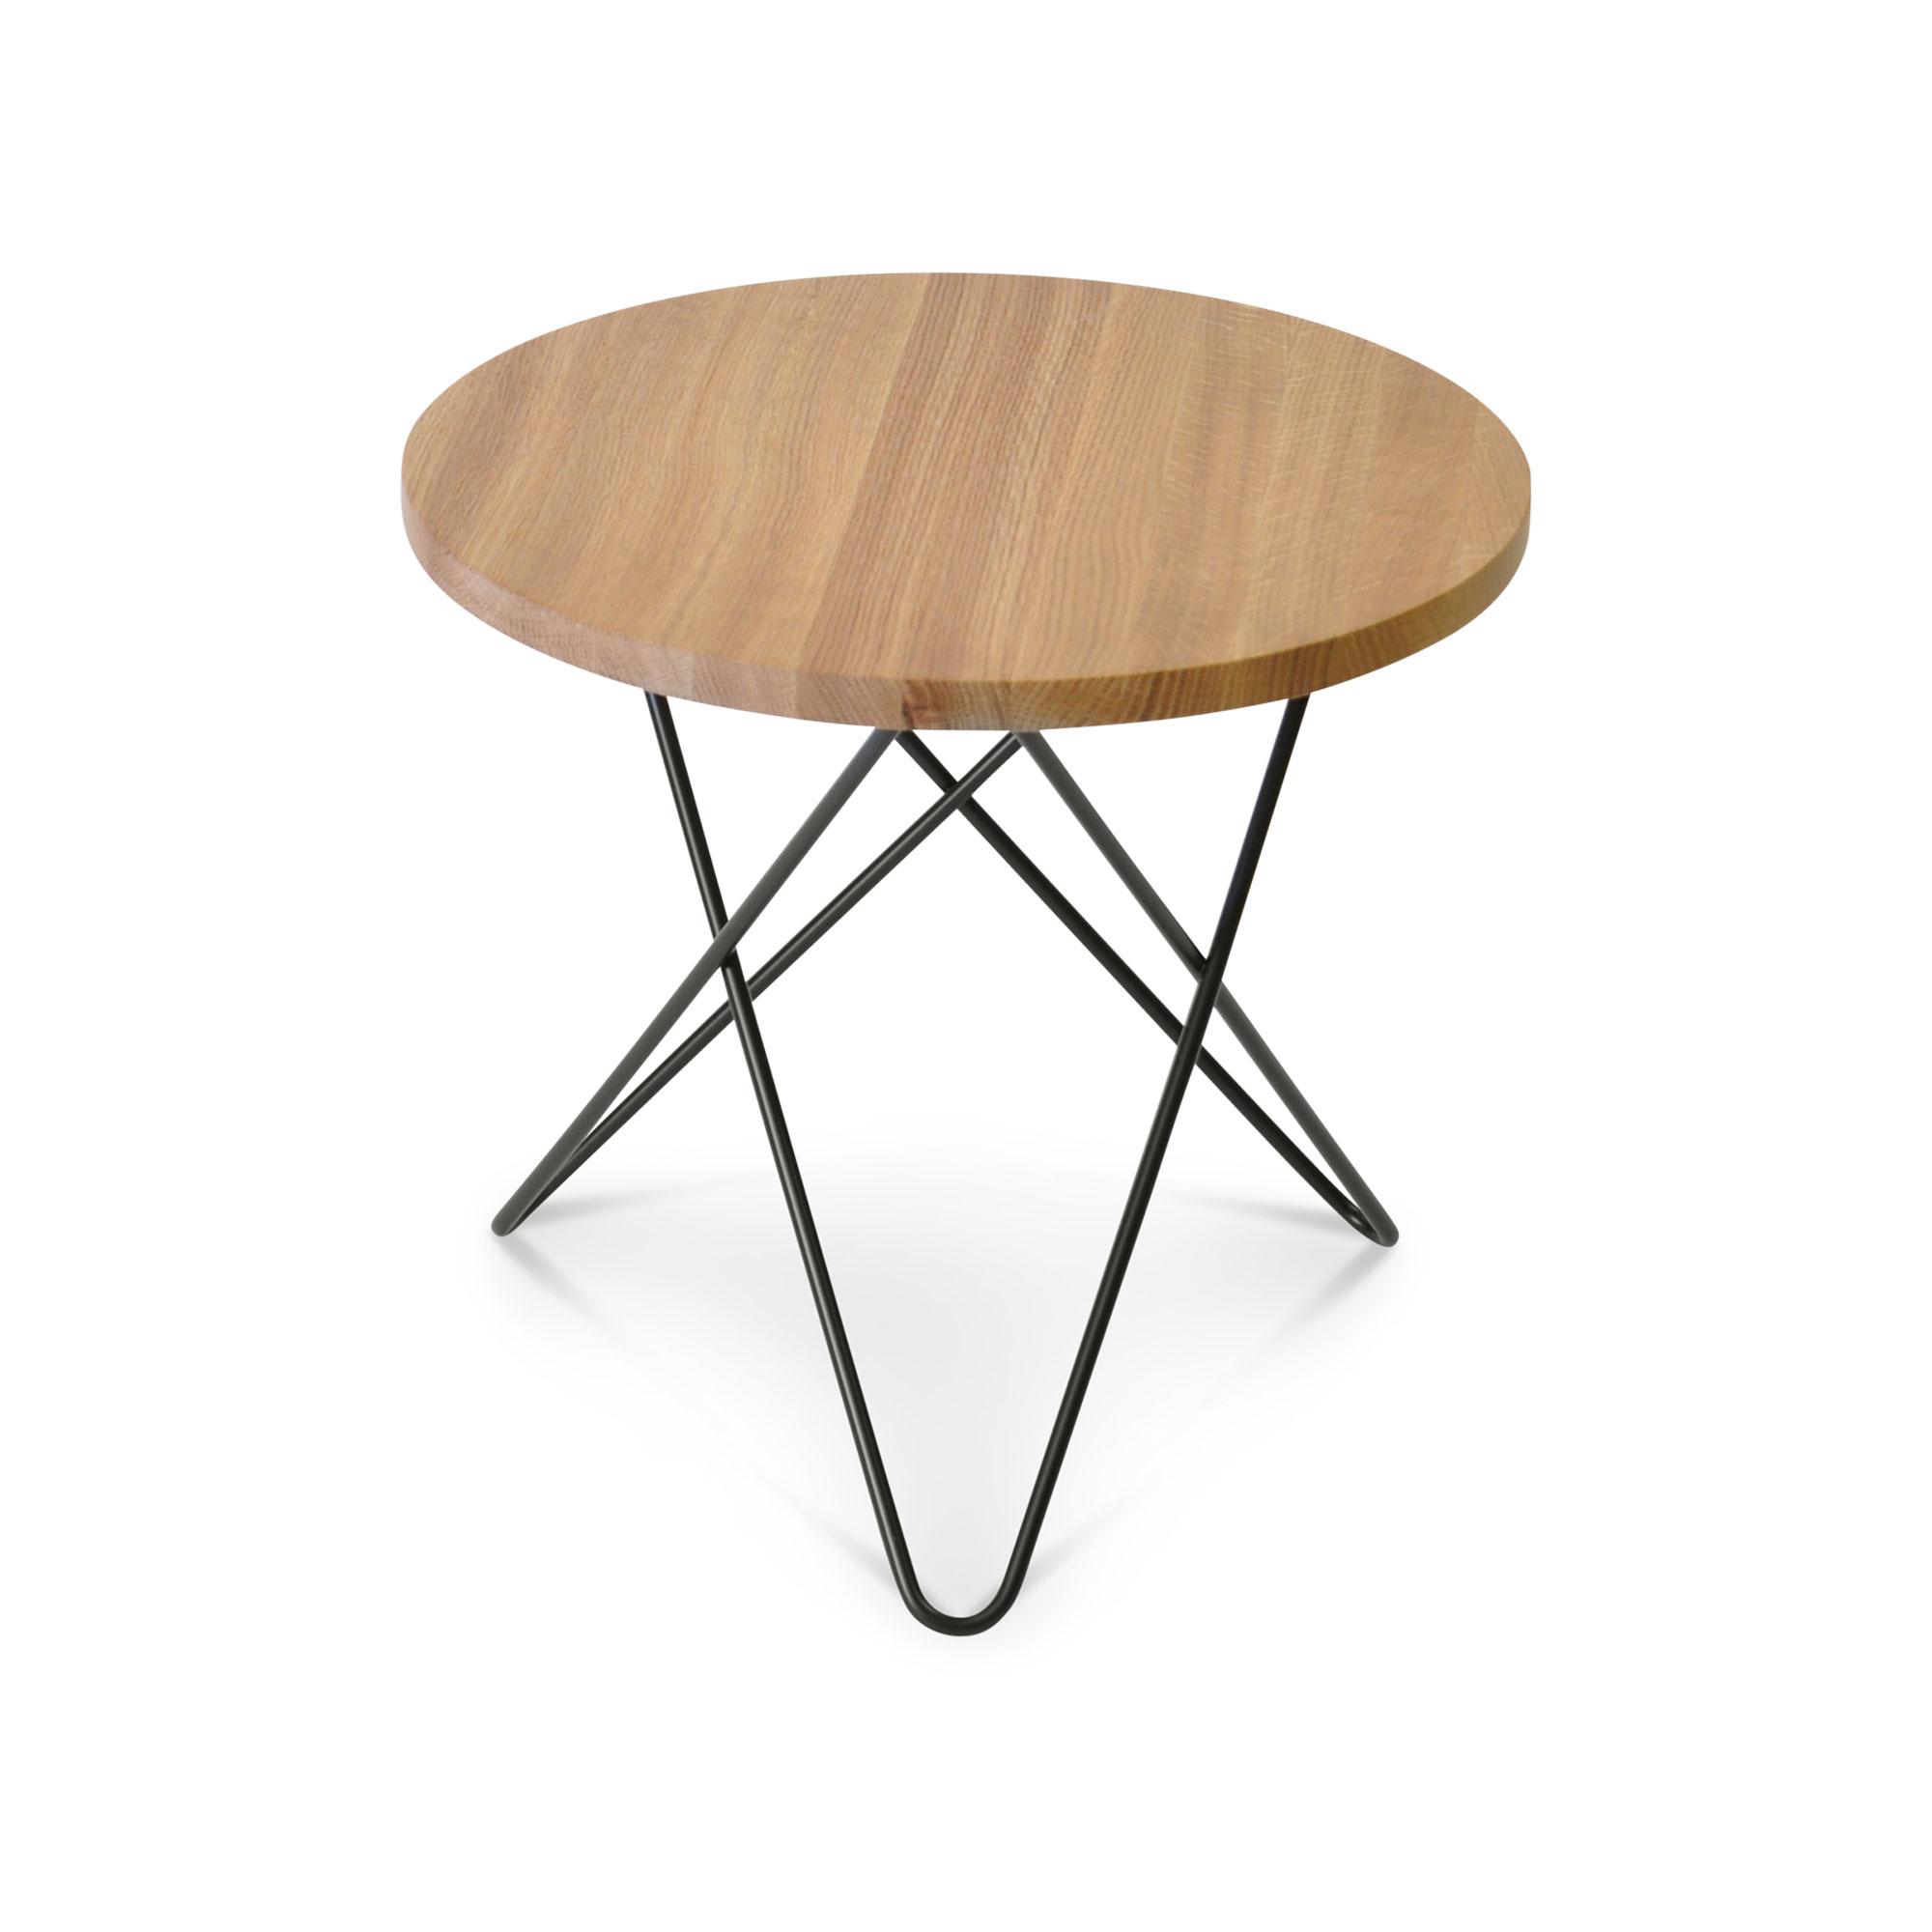 Köp Mini o table Läder sidobord online | Bord | KitchenTime